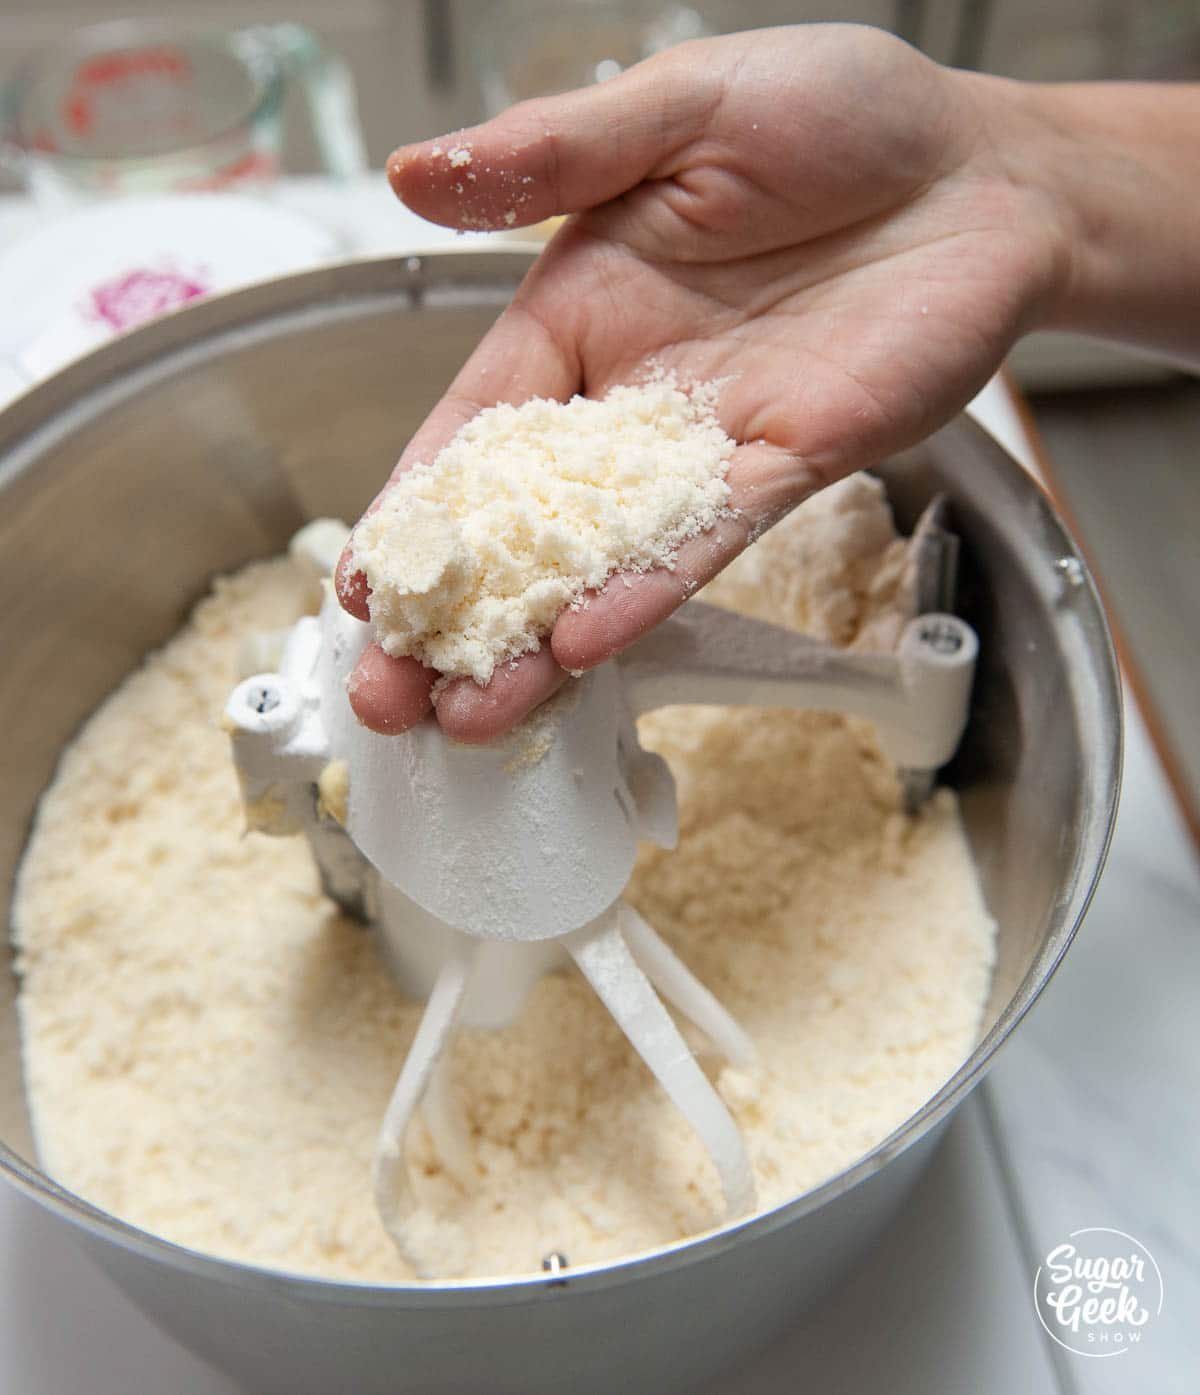 vanilla cake ingredients in a mixing bowl